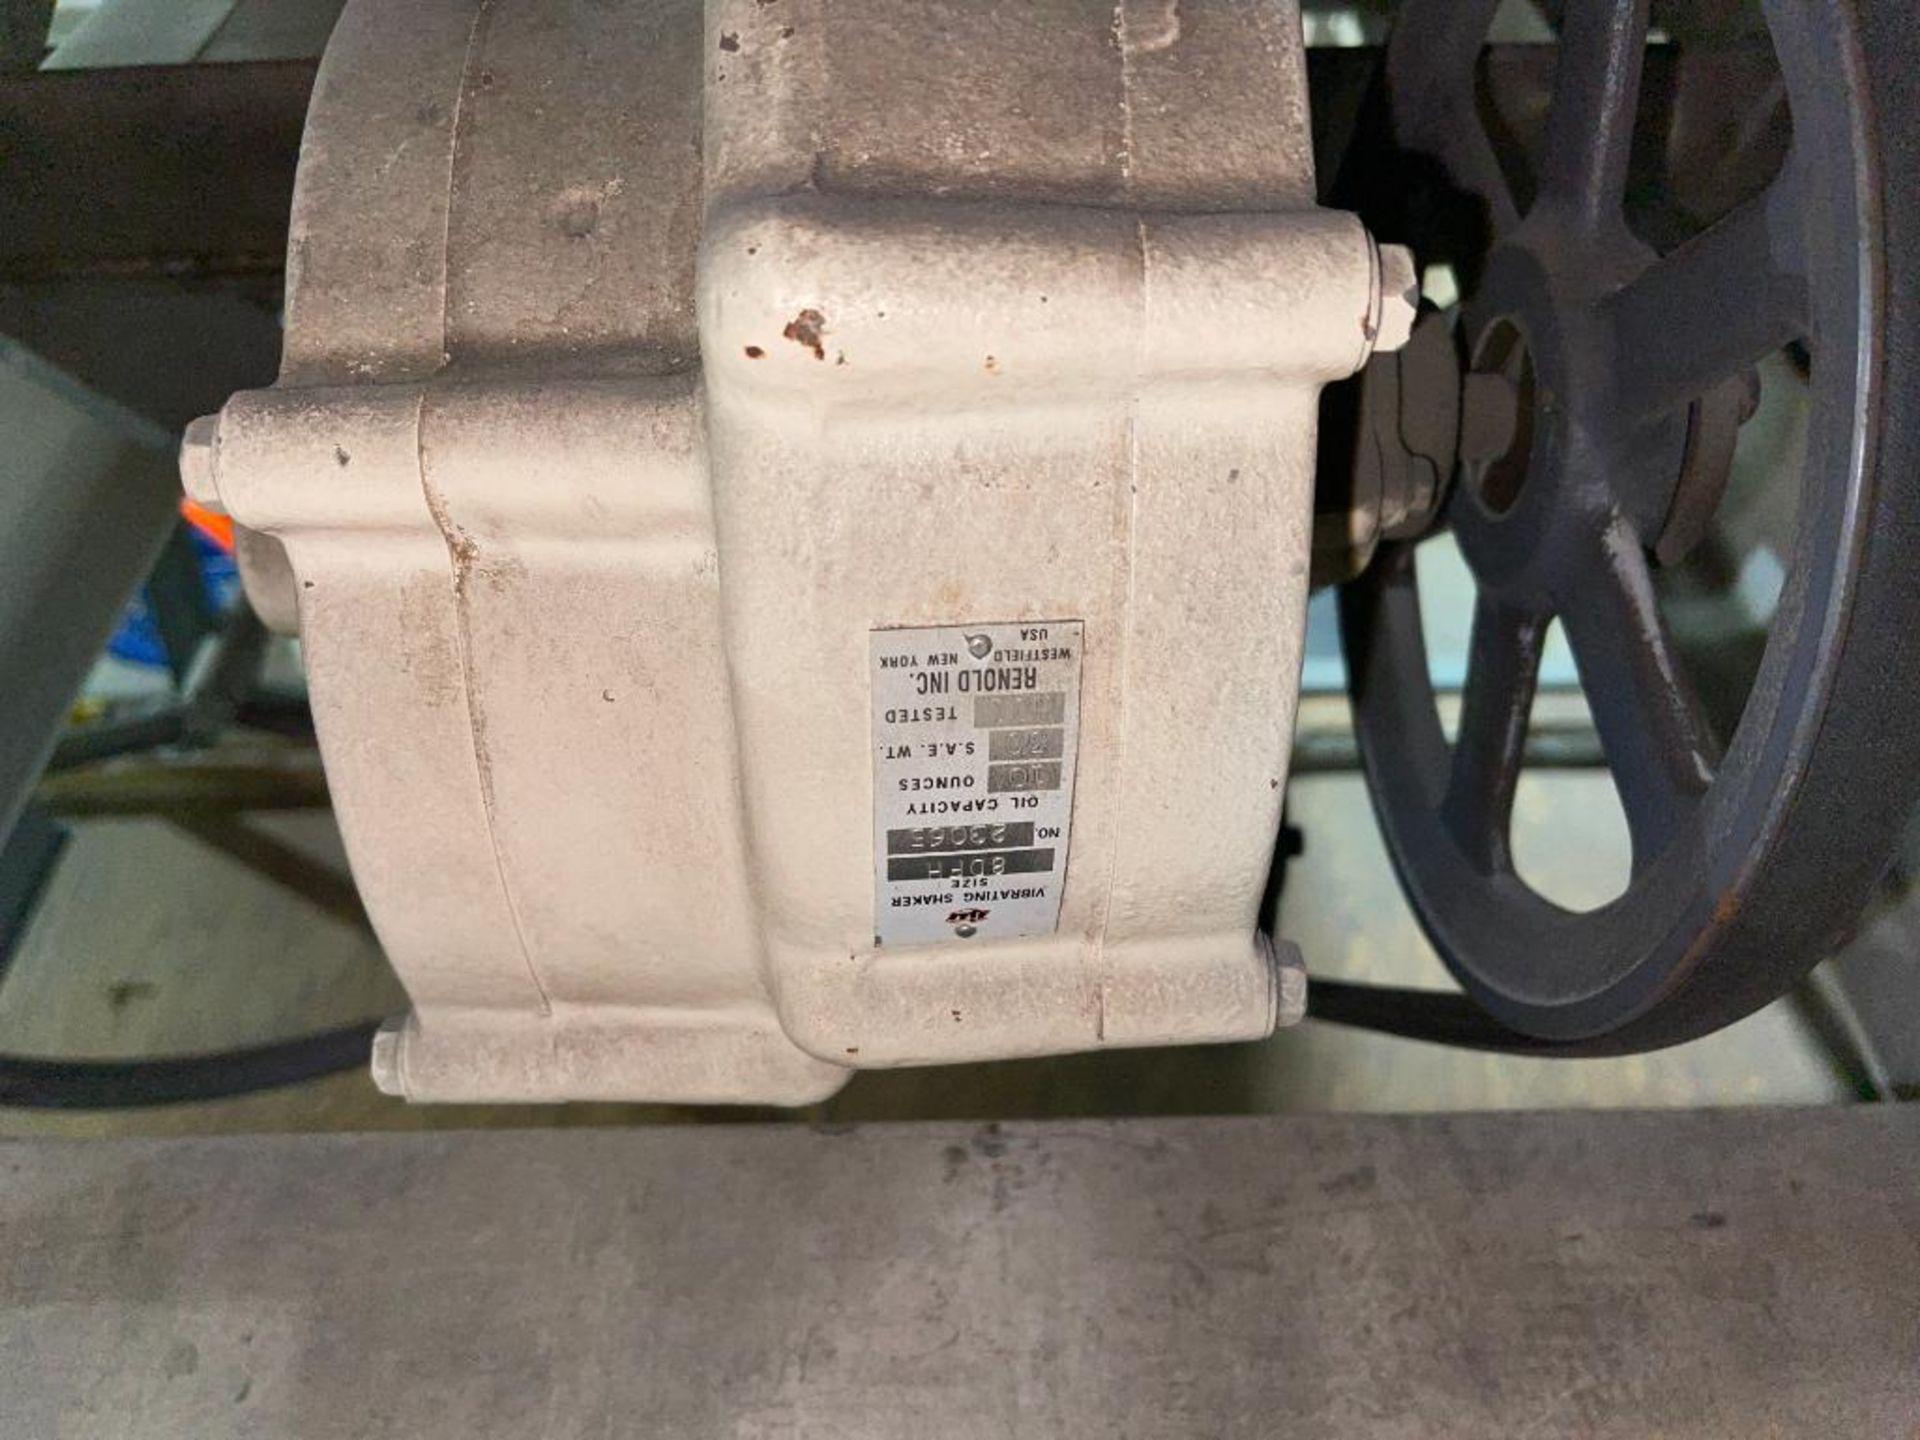 Eriez vibratory conveyor - Image 4 of 7